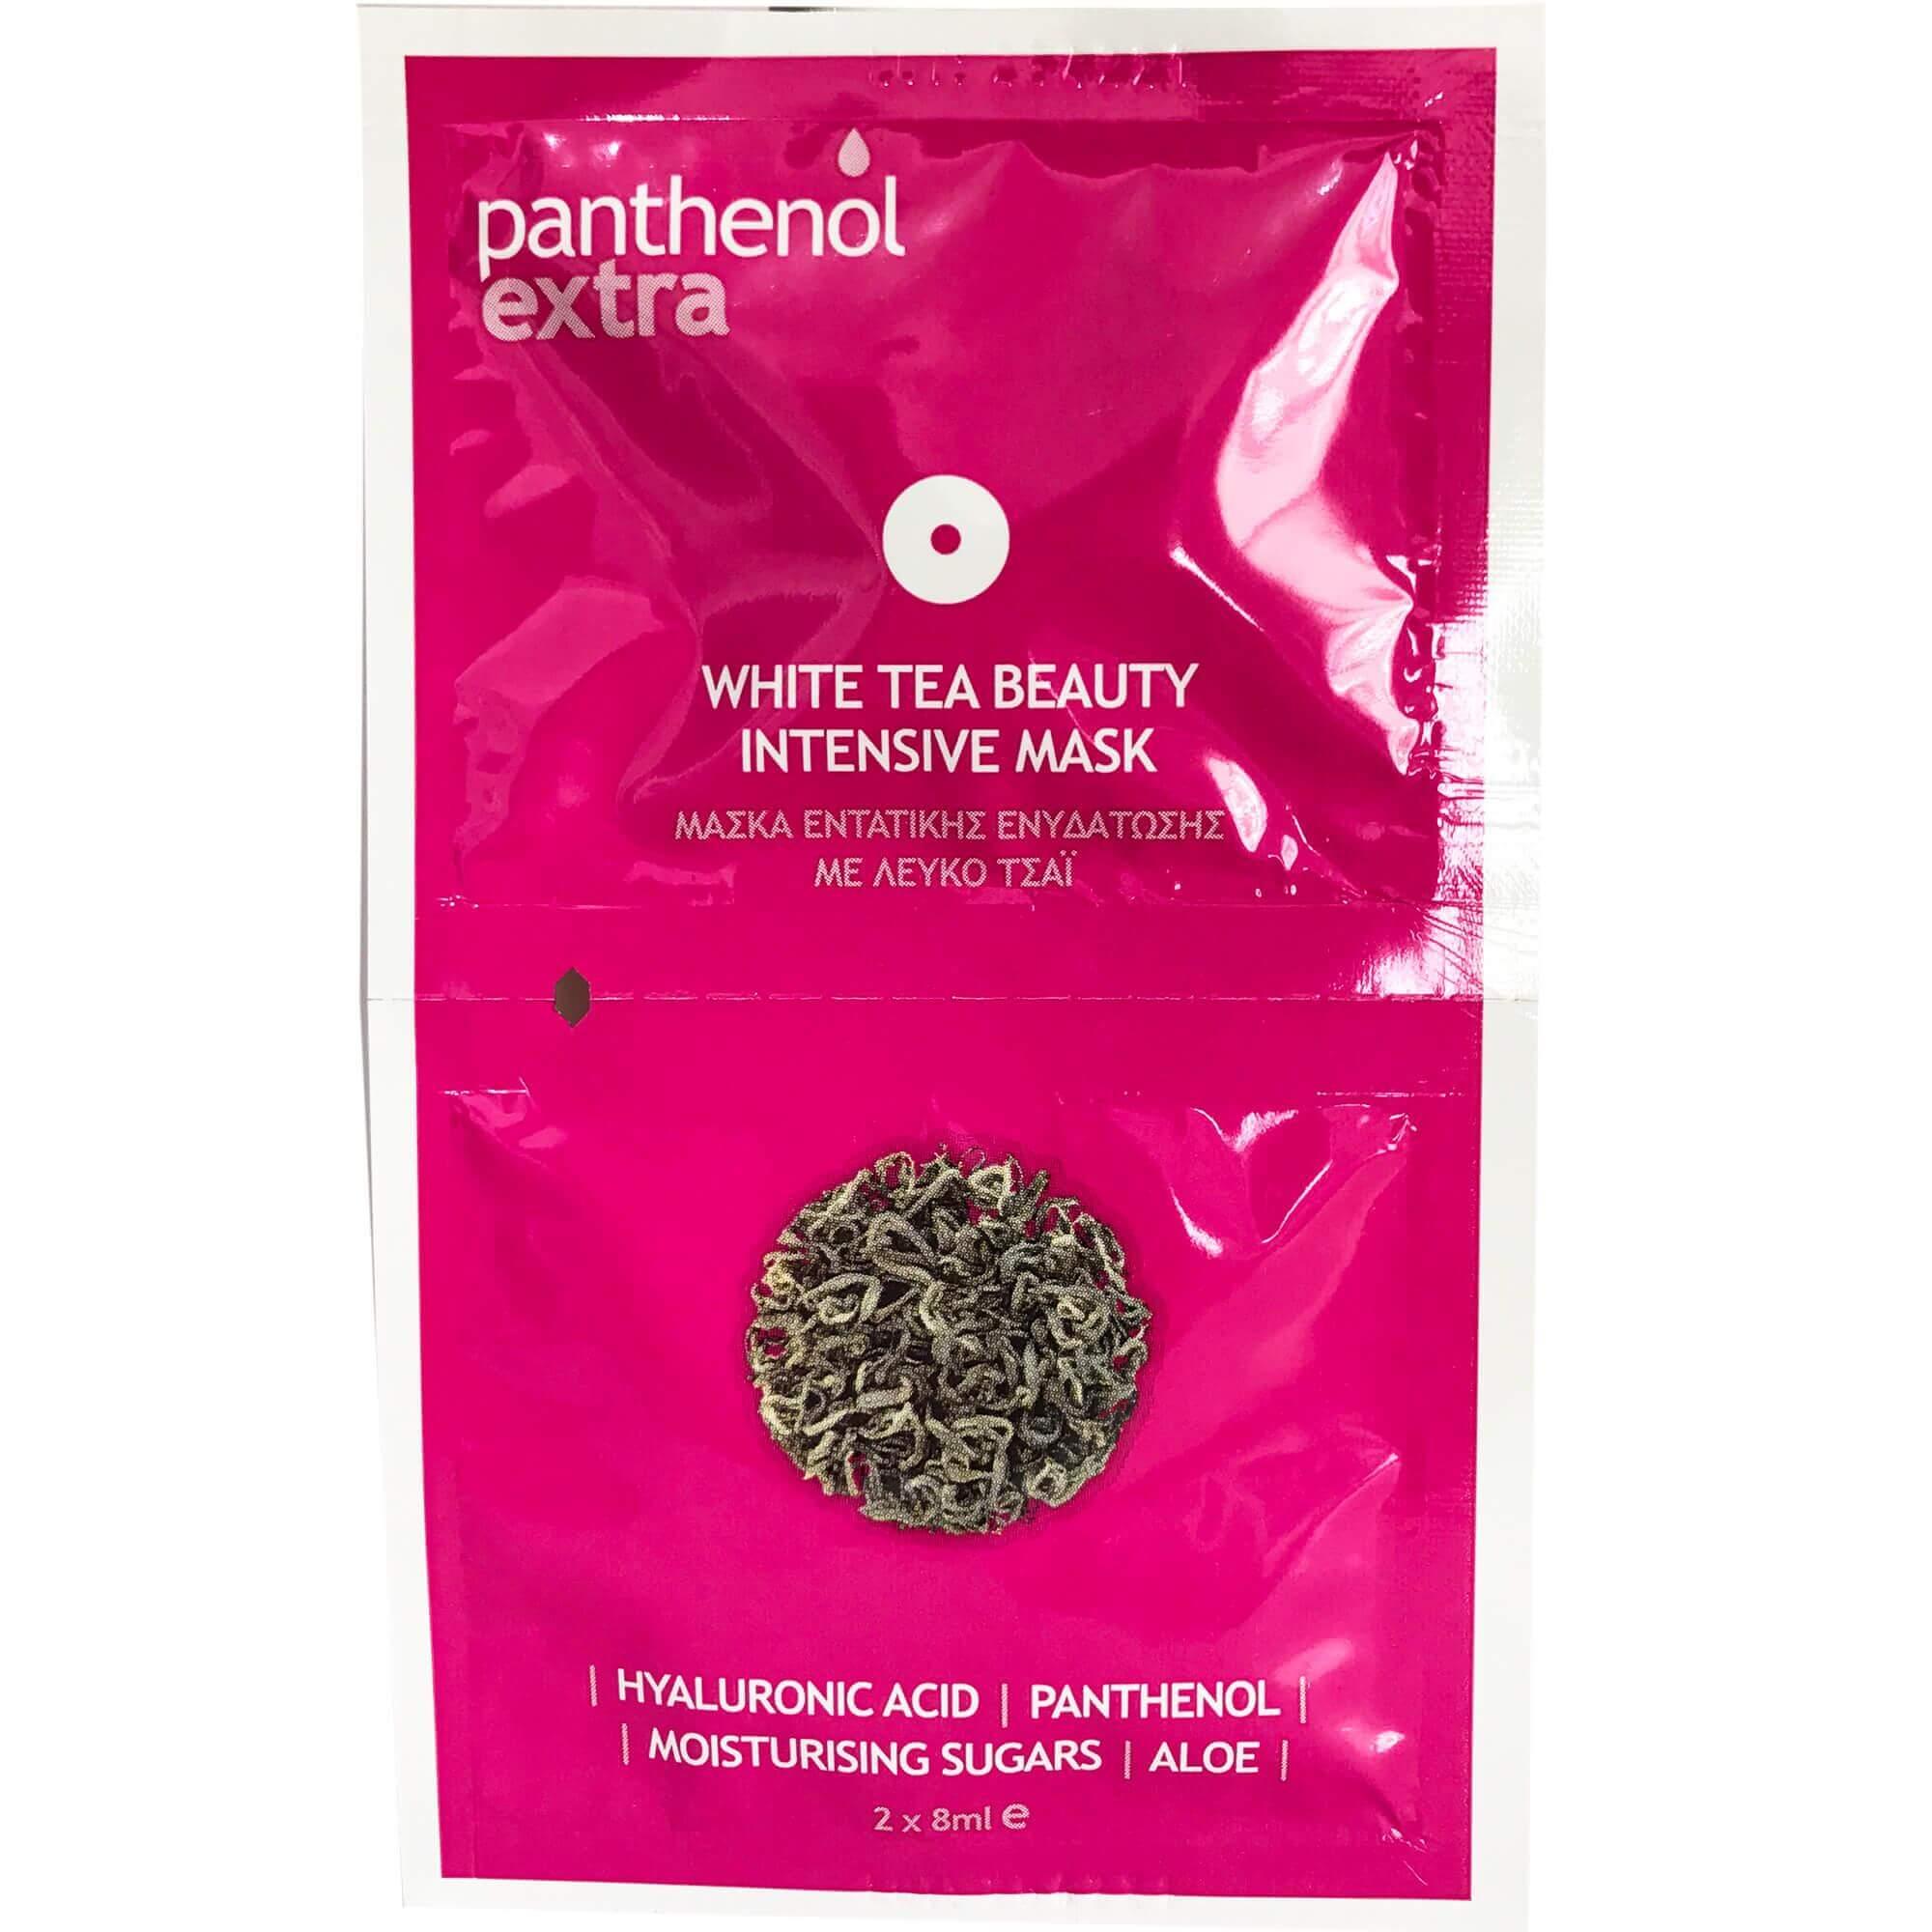 Medisei Panthenol Extra White Tea Beauty Intensive Mask Μάσκα με Λευκό Τσάιγια Ενυδάτωση, Λάμψη &Θρέψη 2x8ml